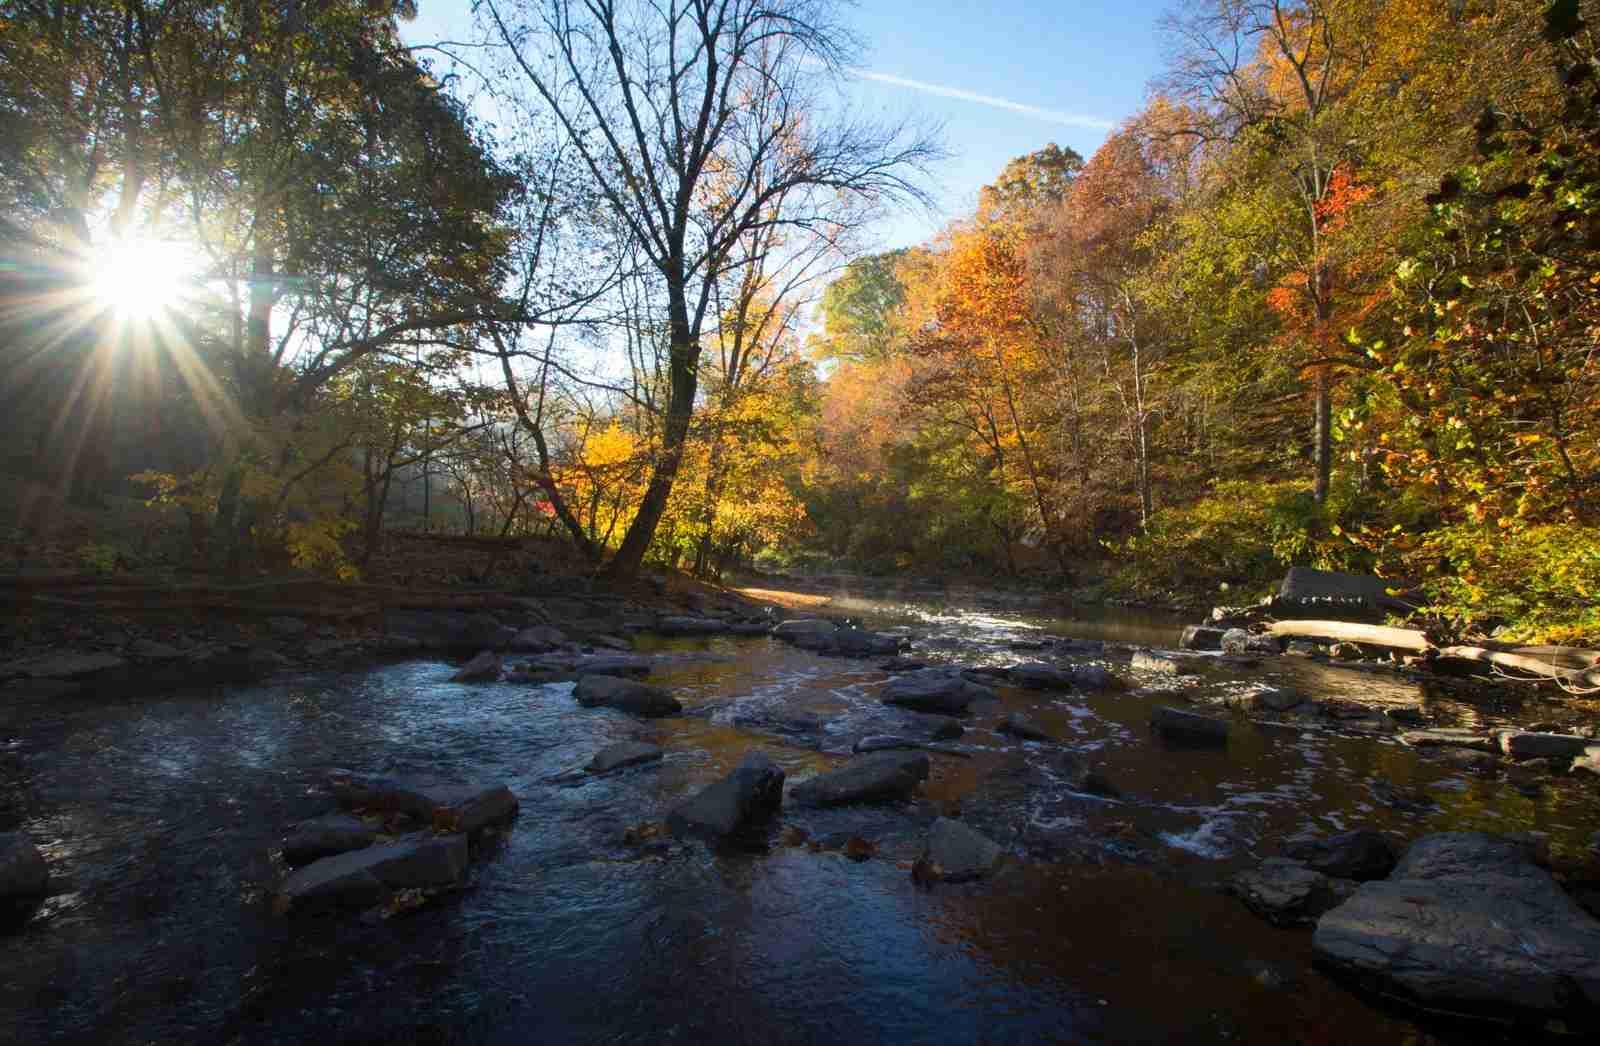 Rock Creek Park, Washington DC. (Photo by WLDavies / Getty Images)